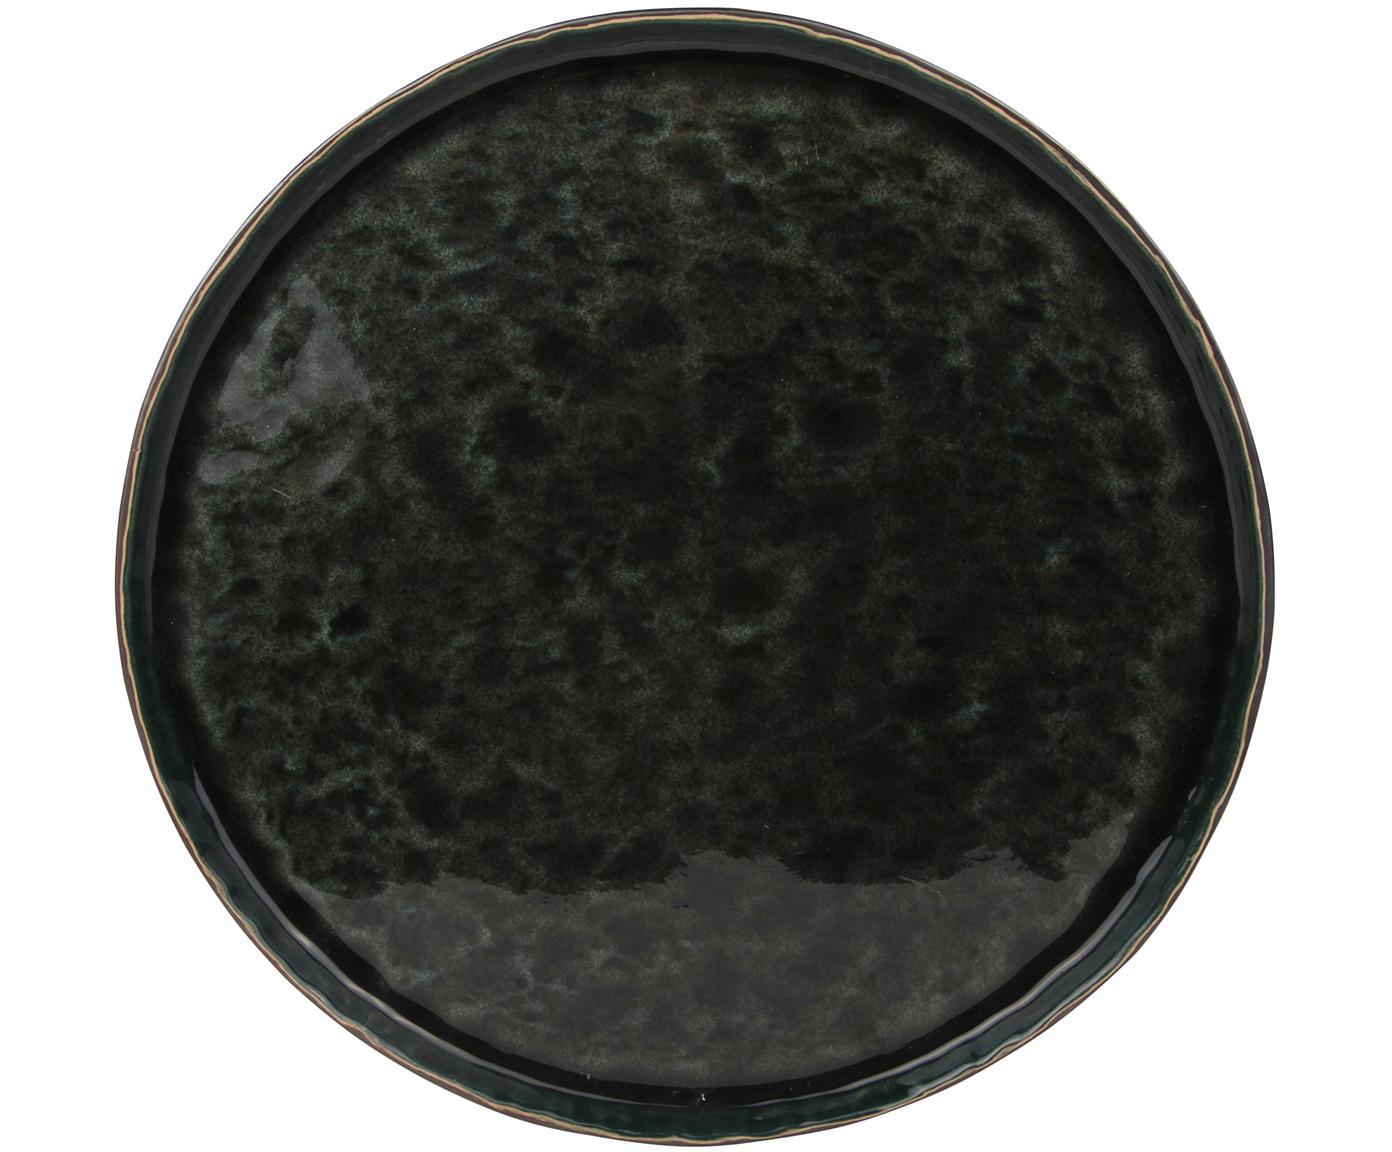 Platos llanos Lagune, 4uds., Cerámica, Gris topo, marrón negro, Ø 27 cm